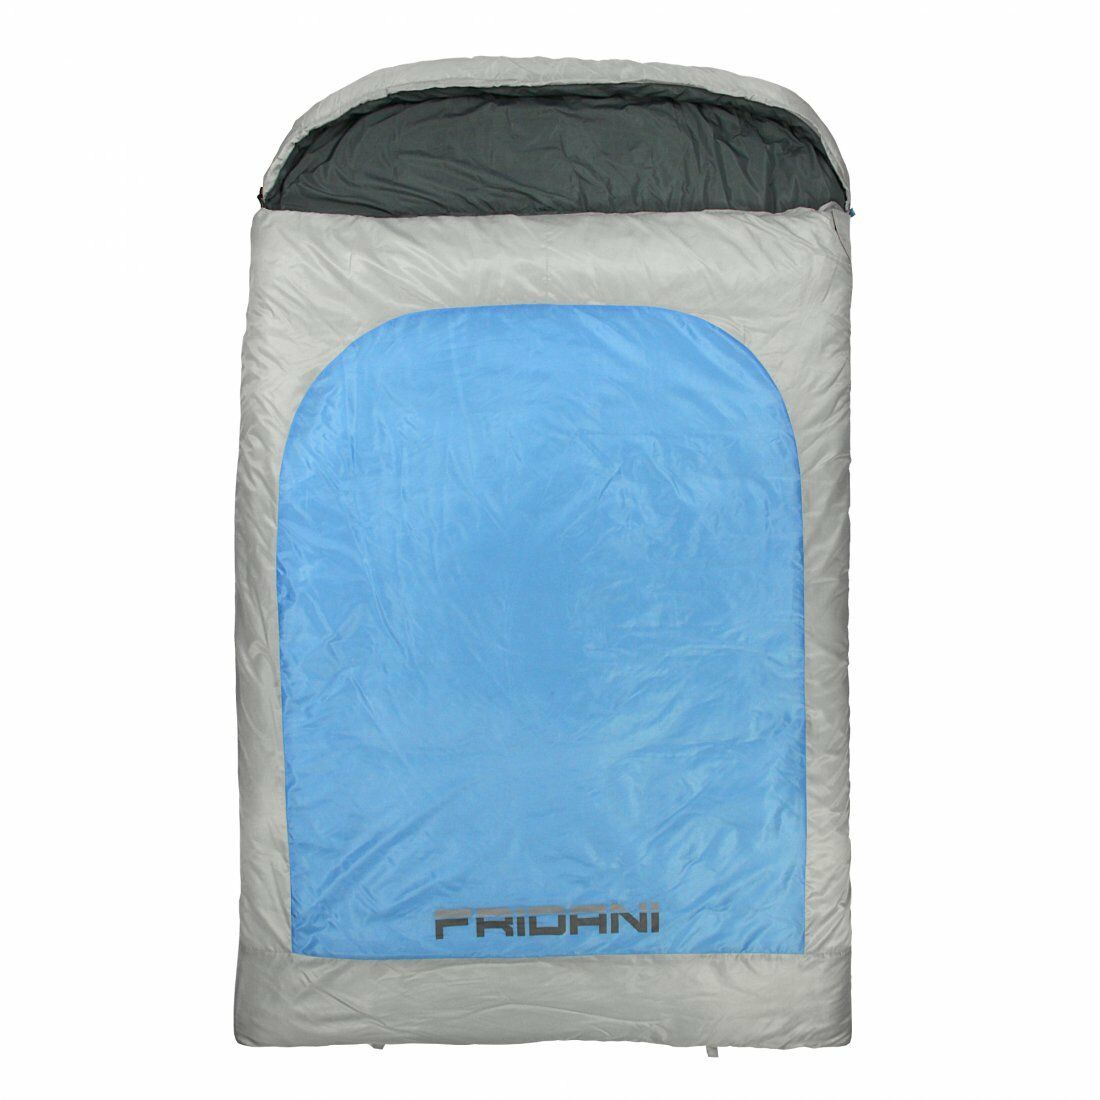 Fridani BB 235D Double - Sacco a pelo a coperta, 235x150cm, 3900 g, -22°C (ext),